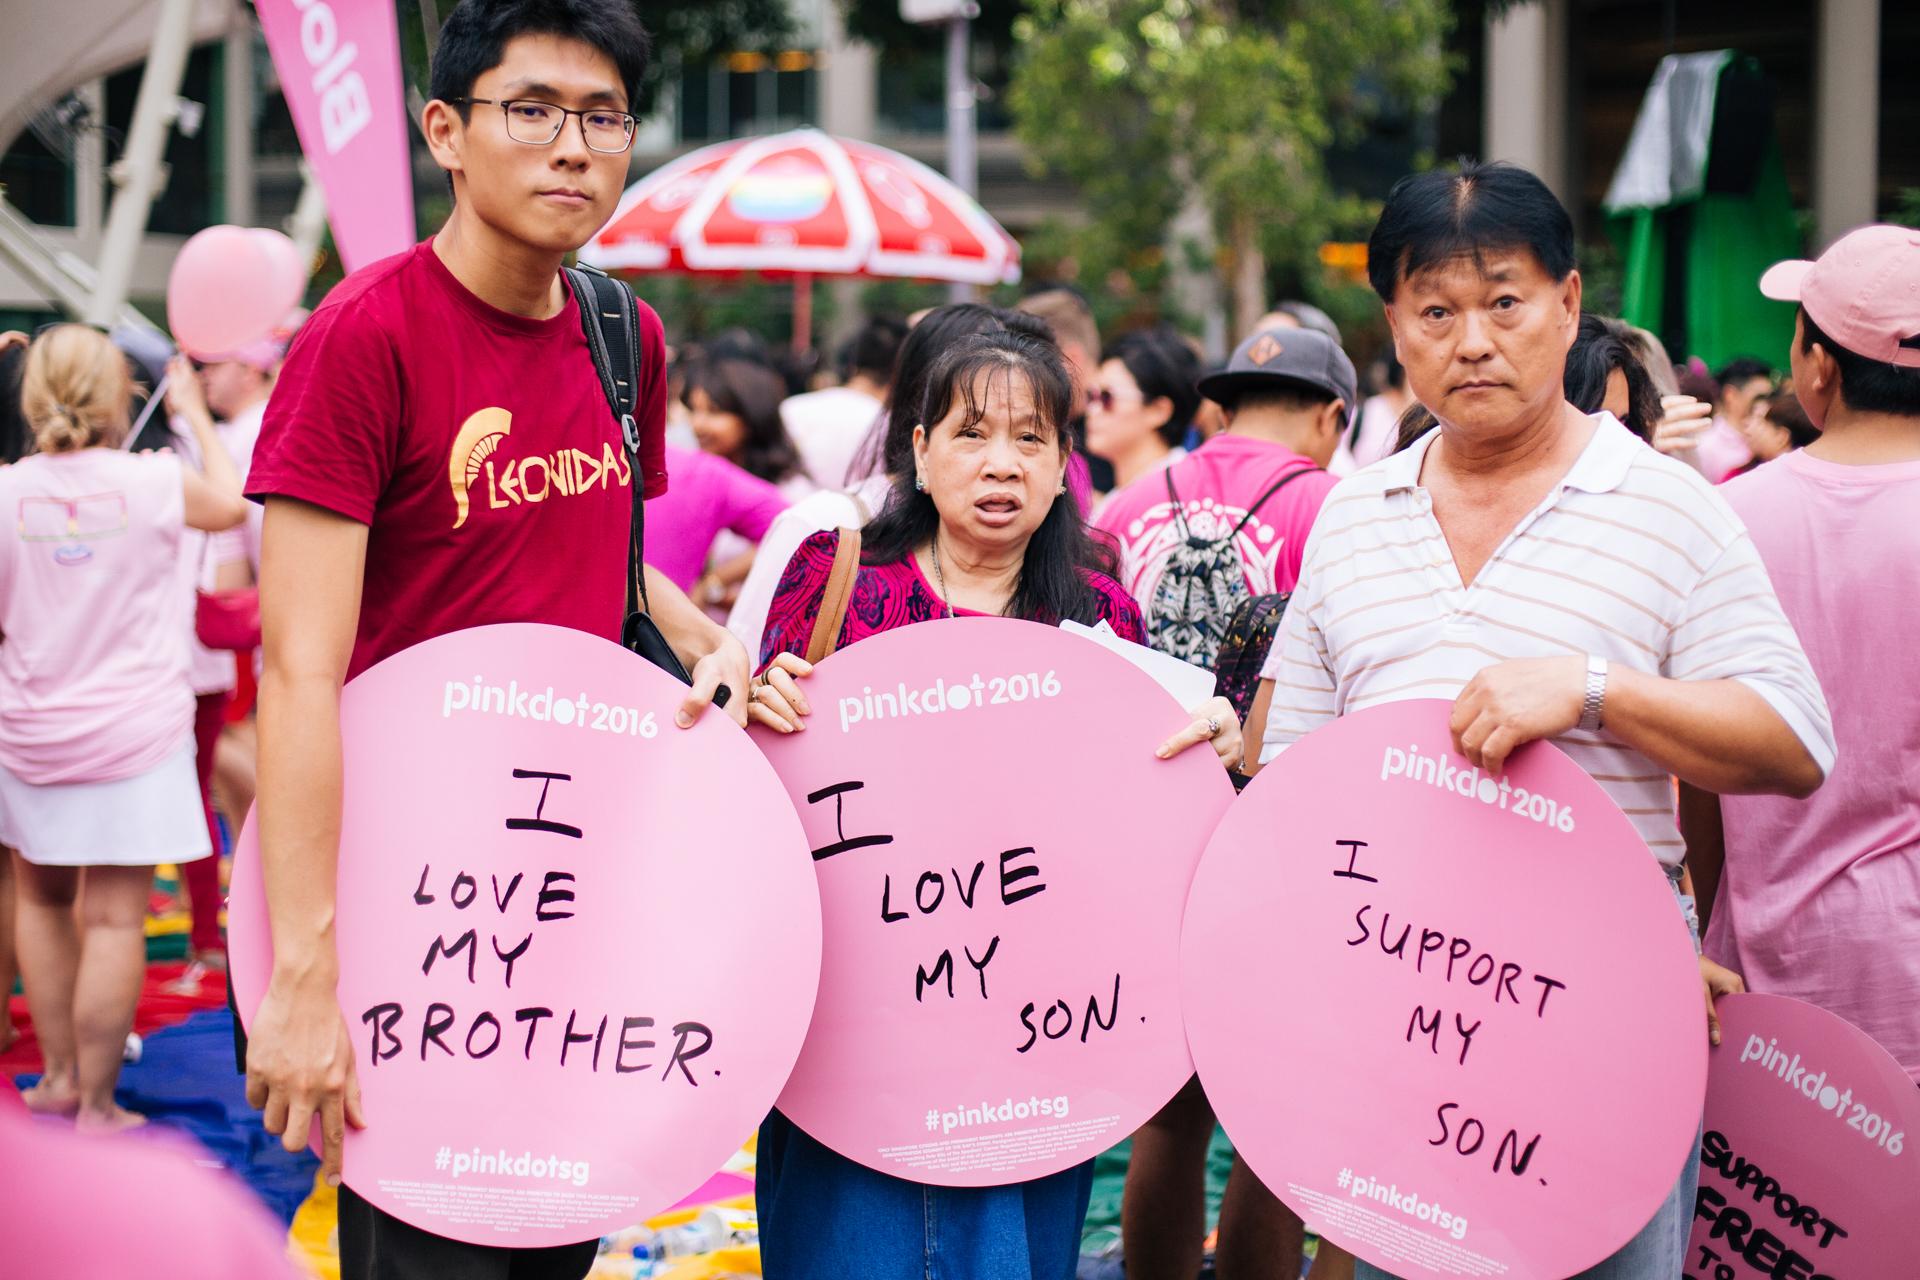 PinkDot Singapore 2016, Singapore (2016)